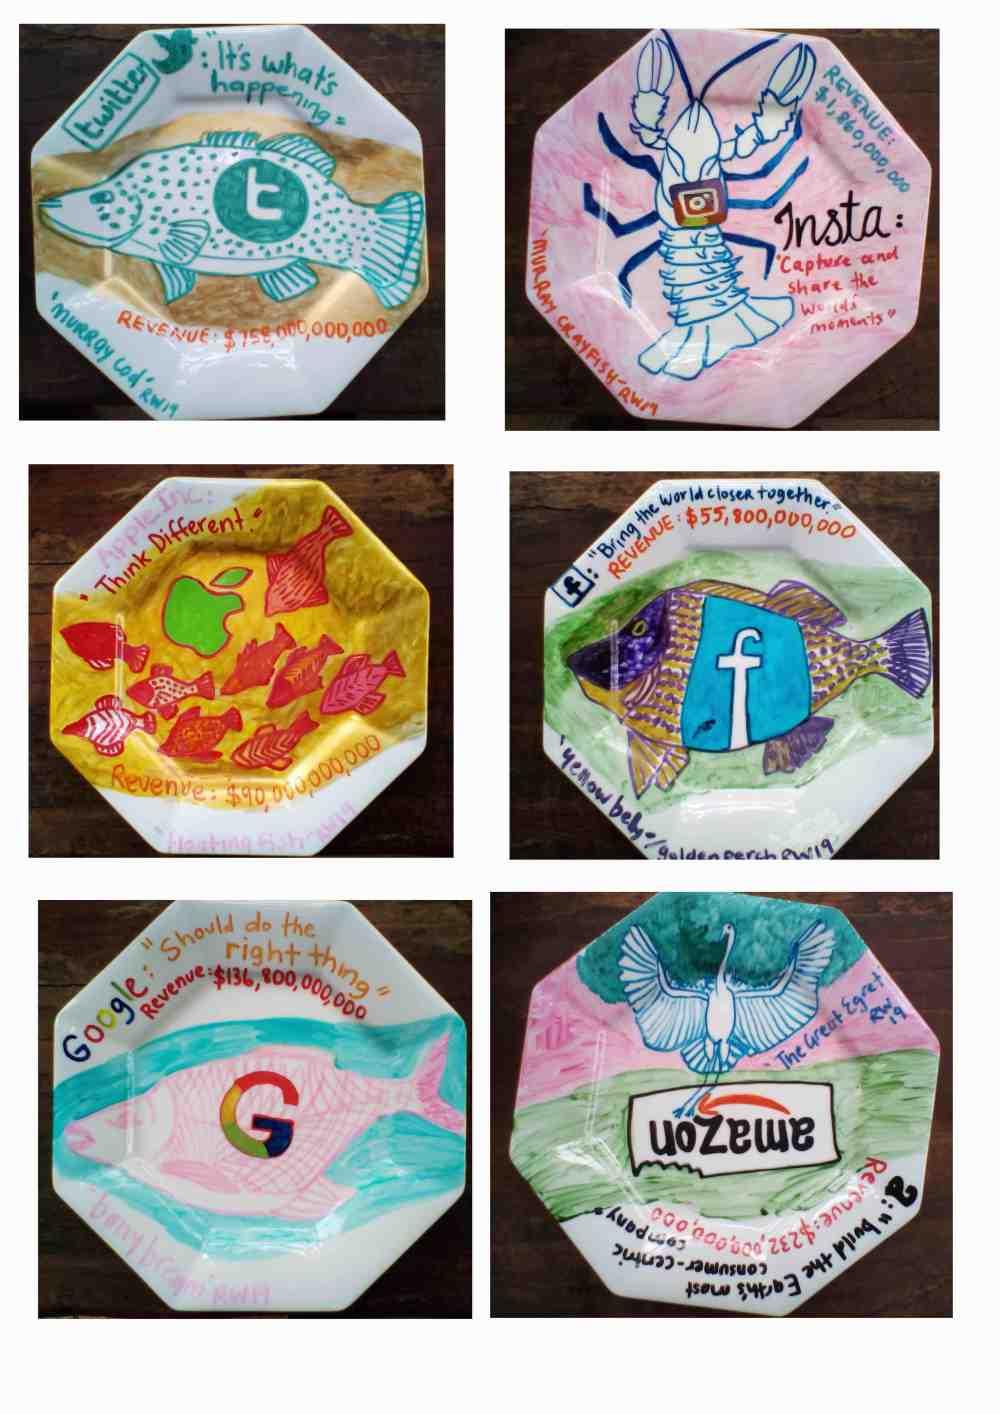 2. The Last Supper? Installation Plates_RWilson2019